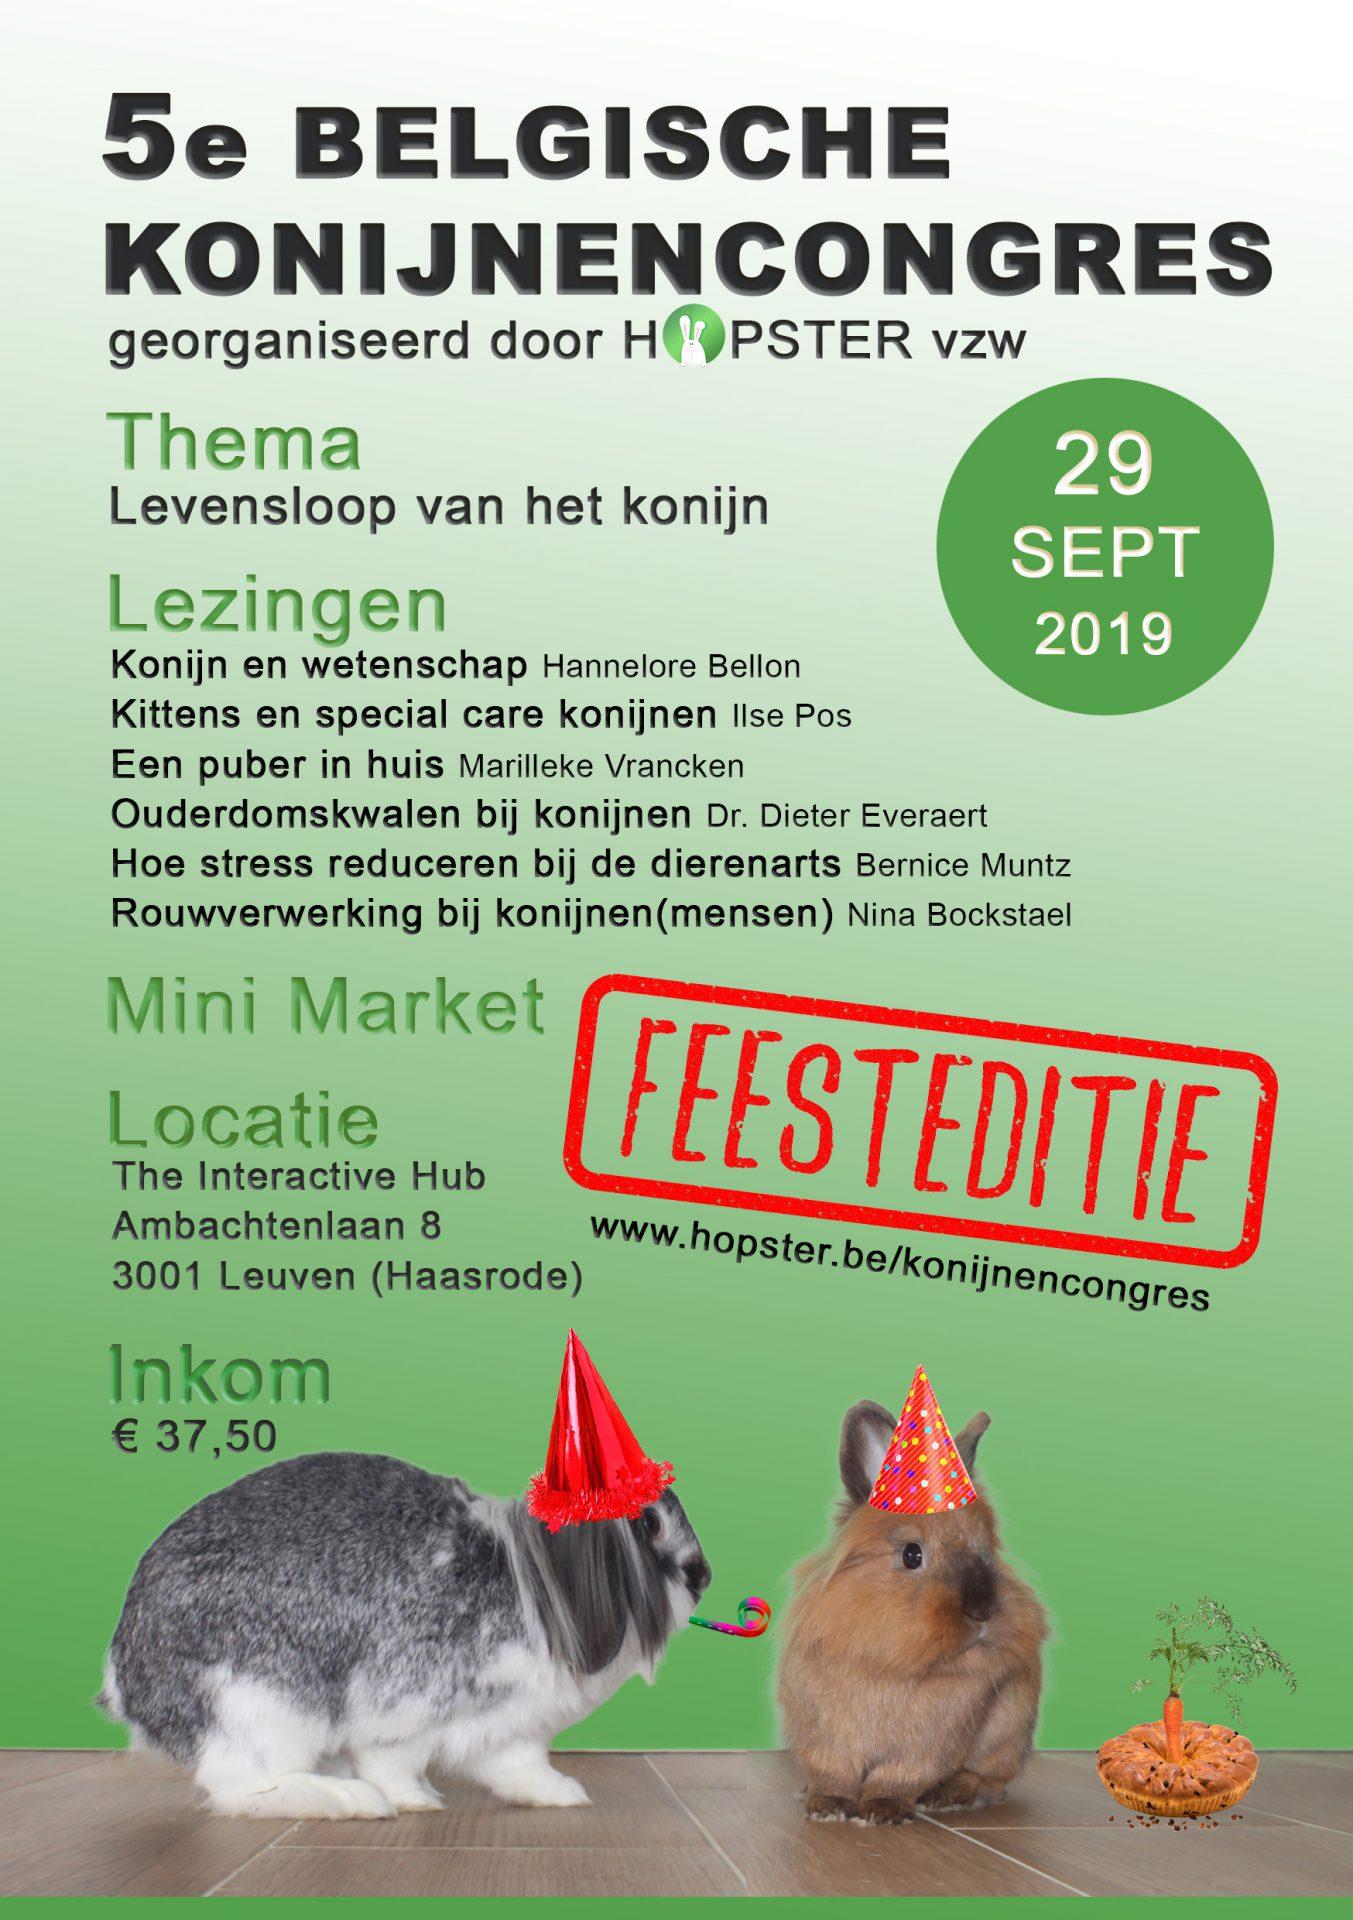 Belgisch Konijnencongres 2019 | Konijnenadviesbureau Hopster